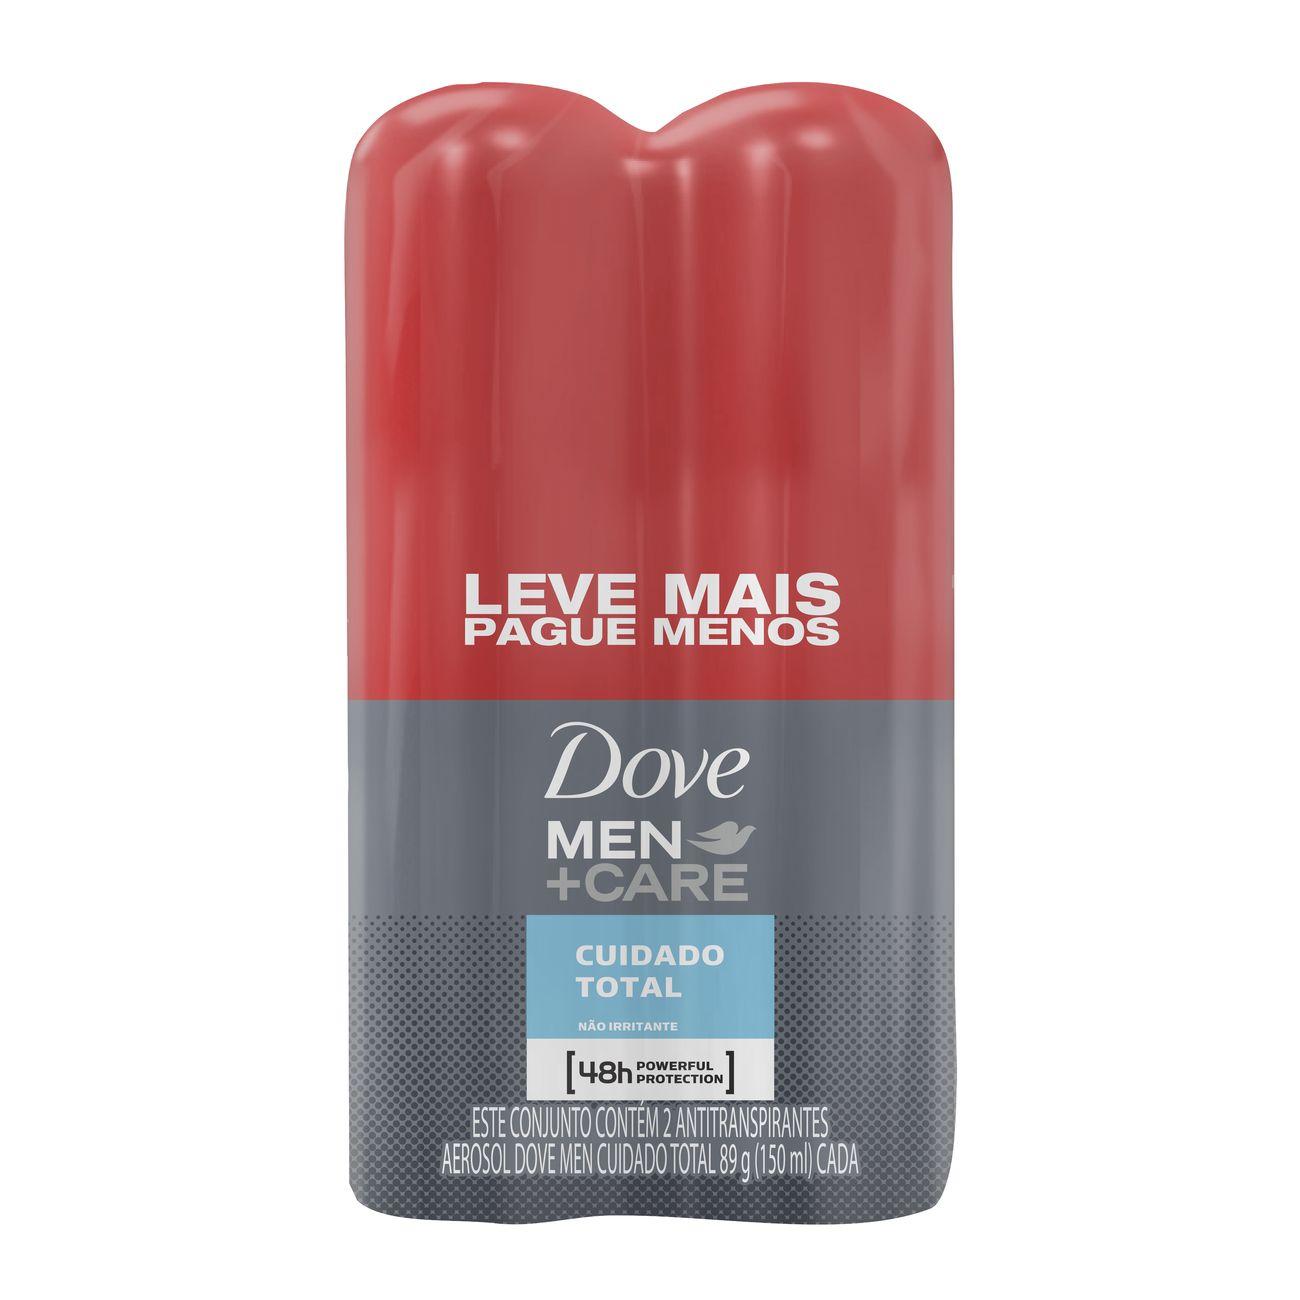 Oferta 2 Desodorante Antitranspirante Aerosol Dove Men Cuidado Total 50% Na Segunda Unidade 150mL